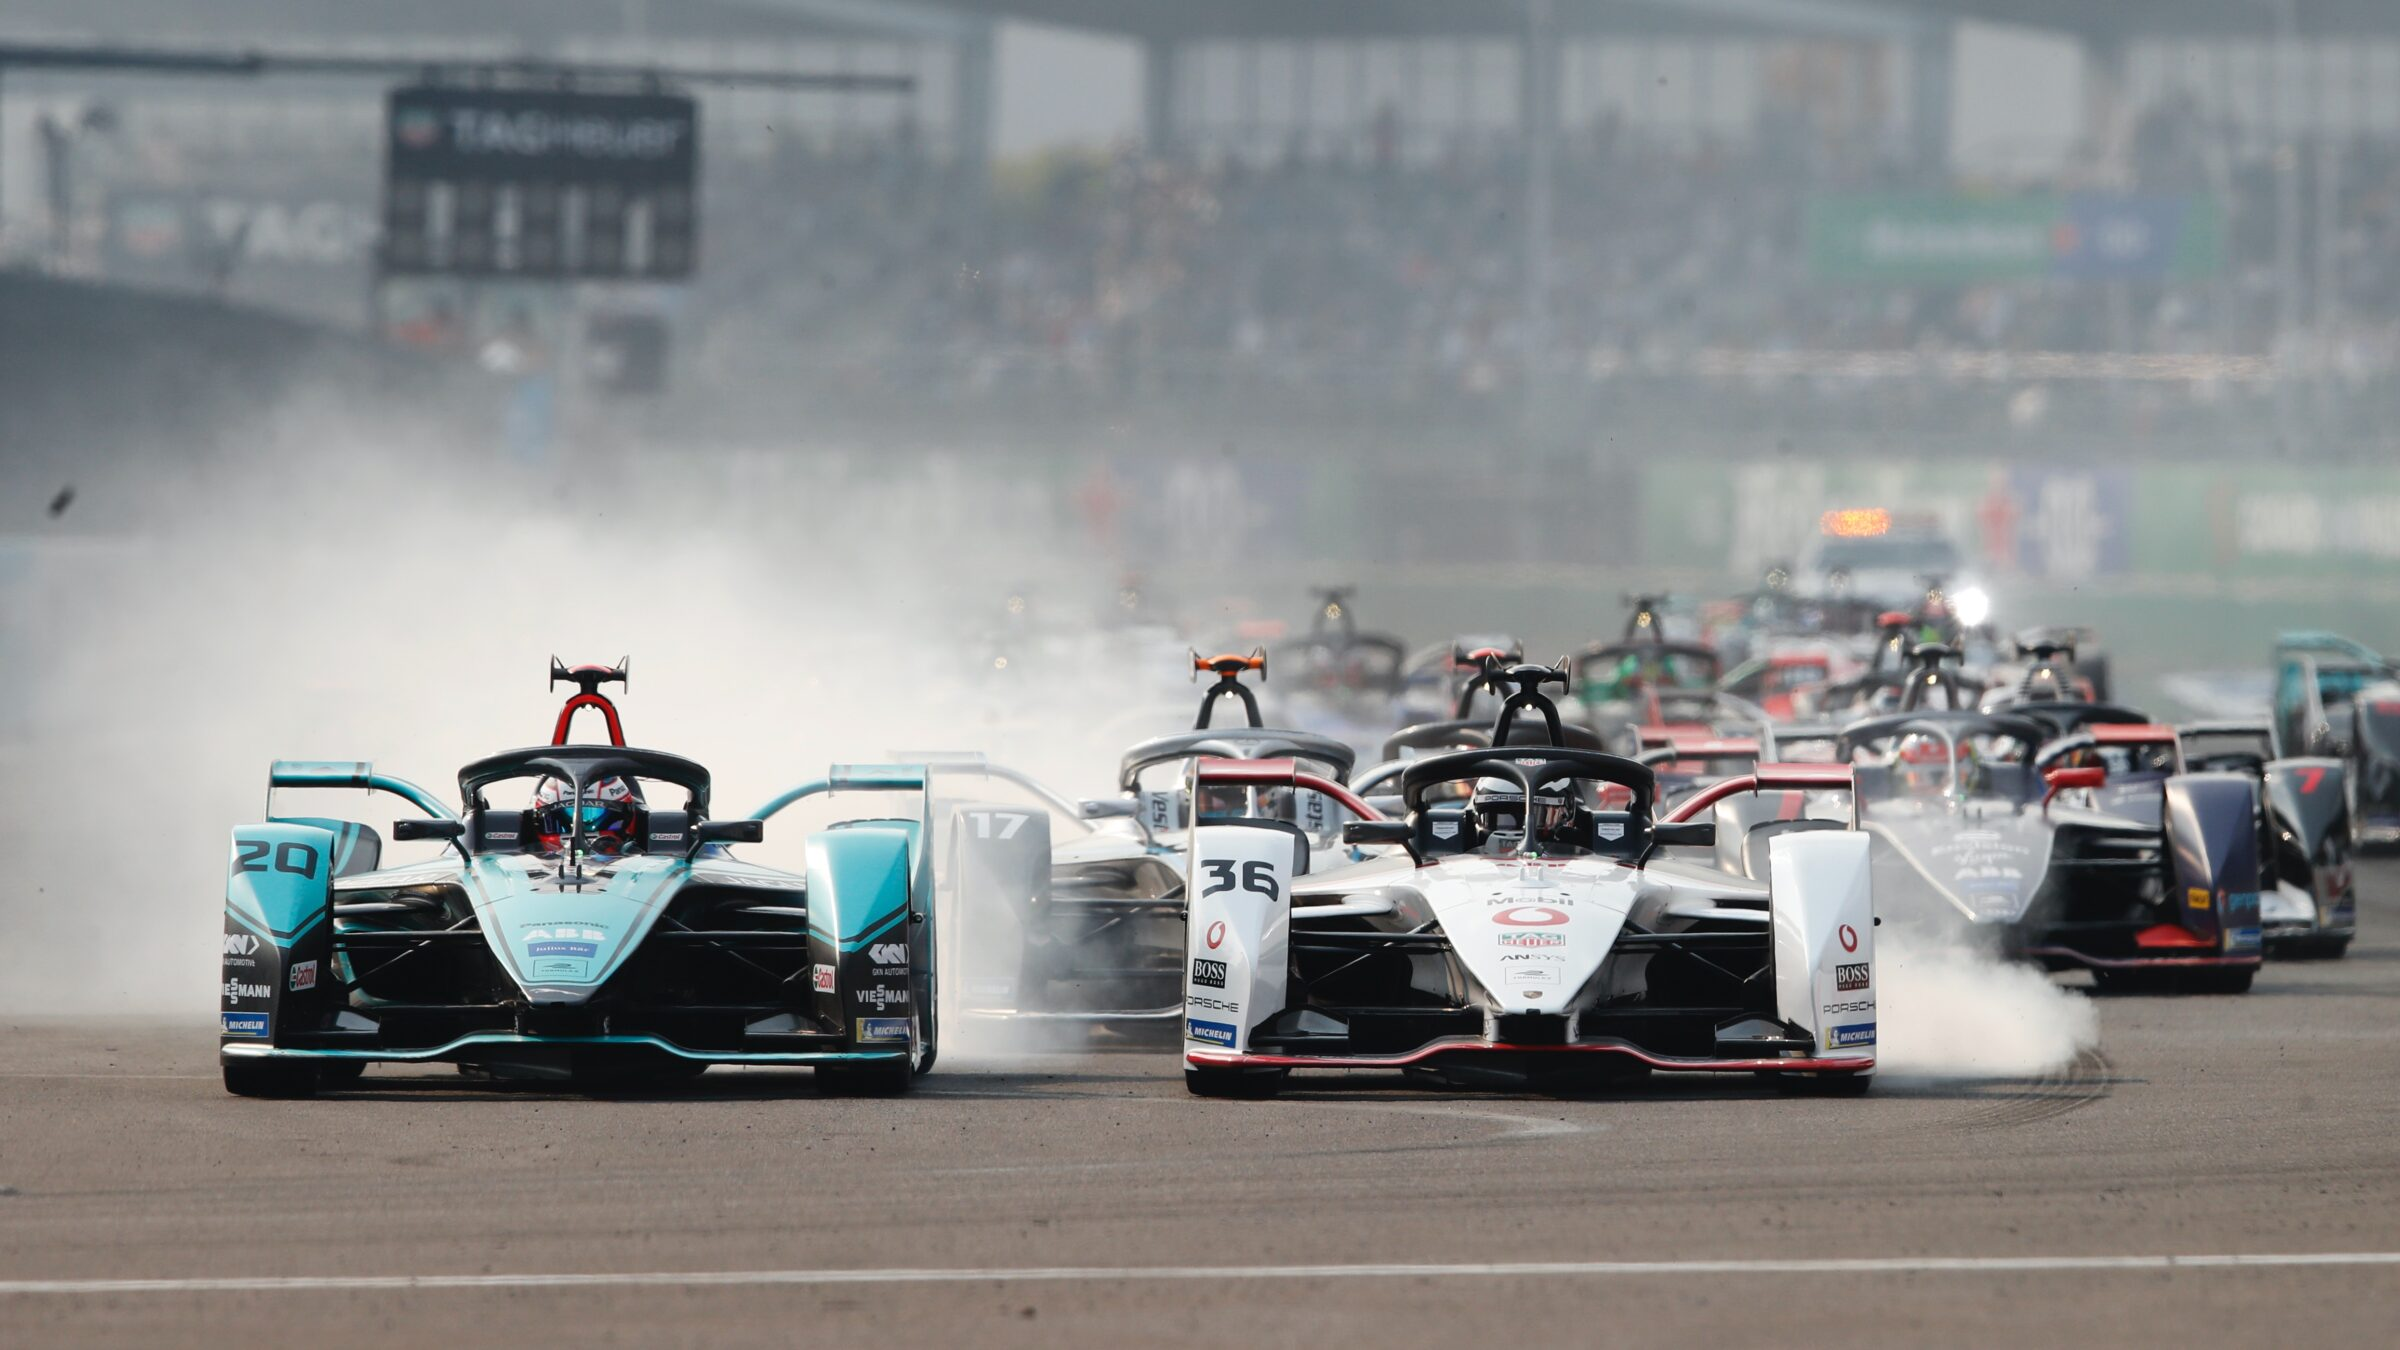 Formule E racewagens